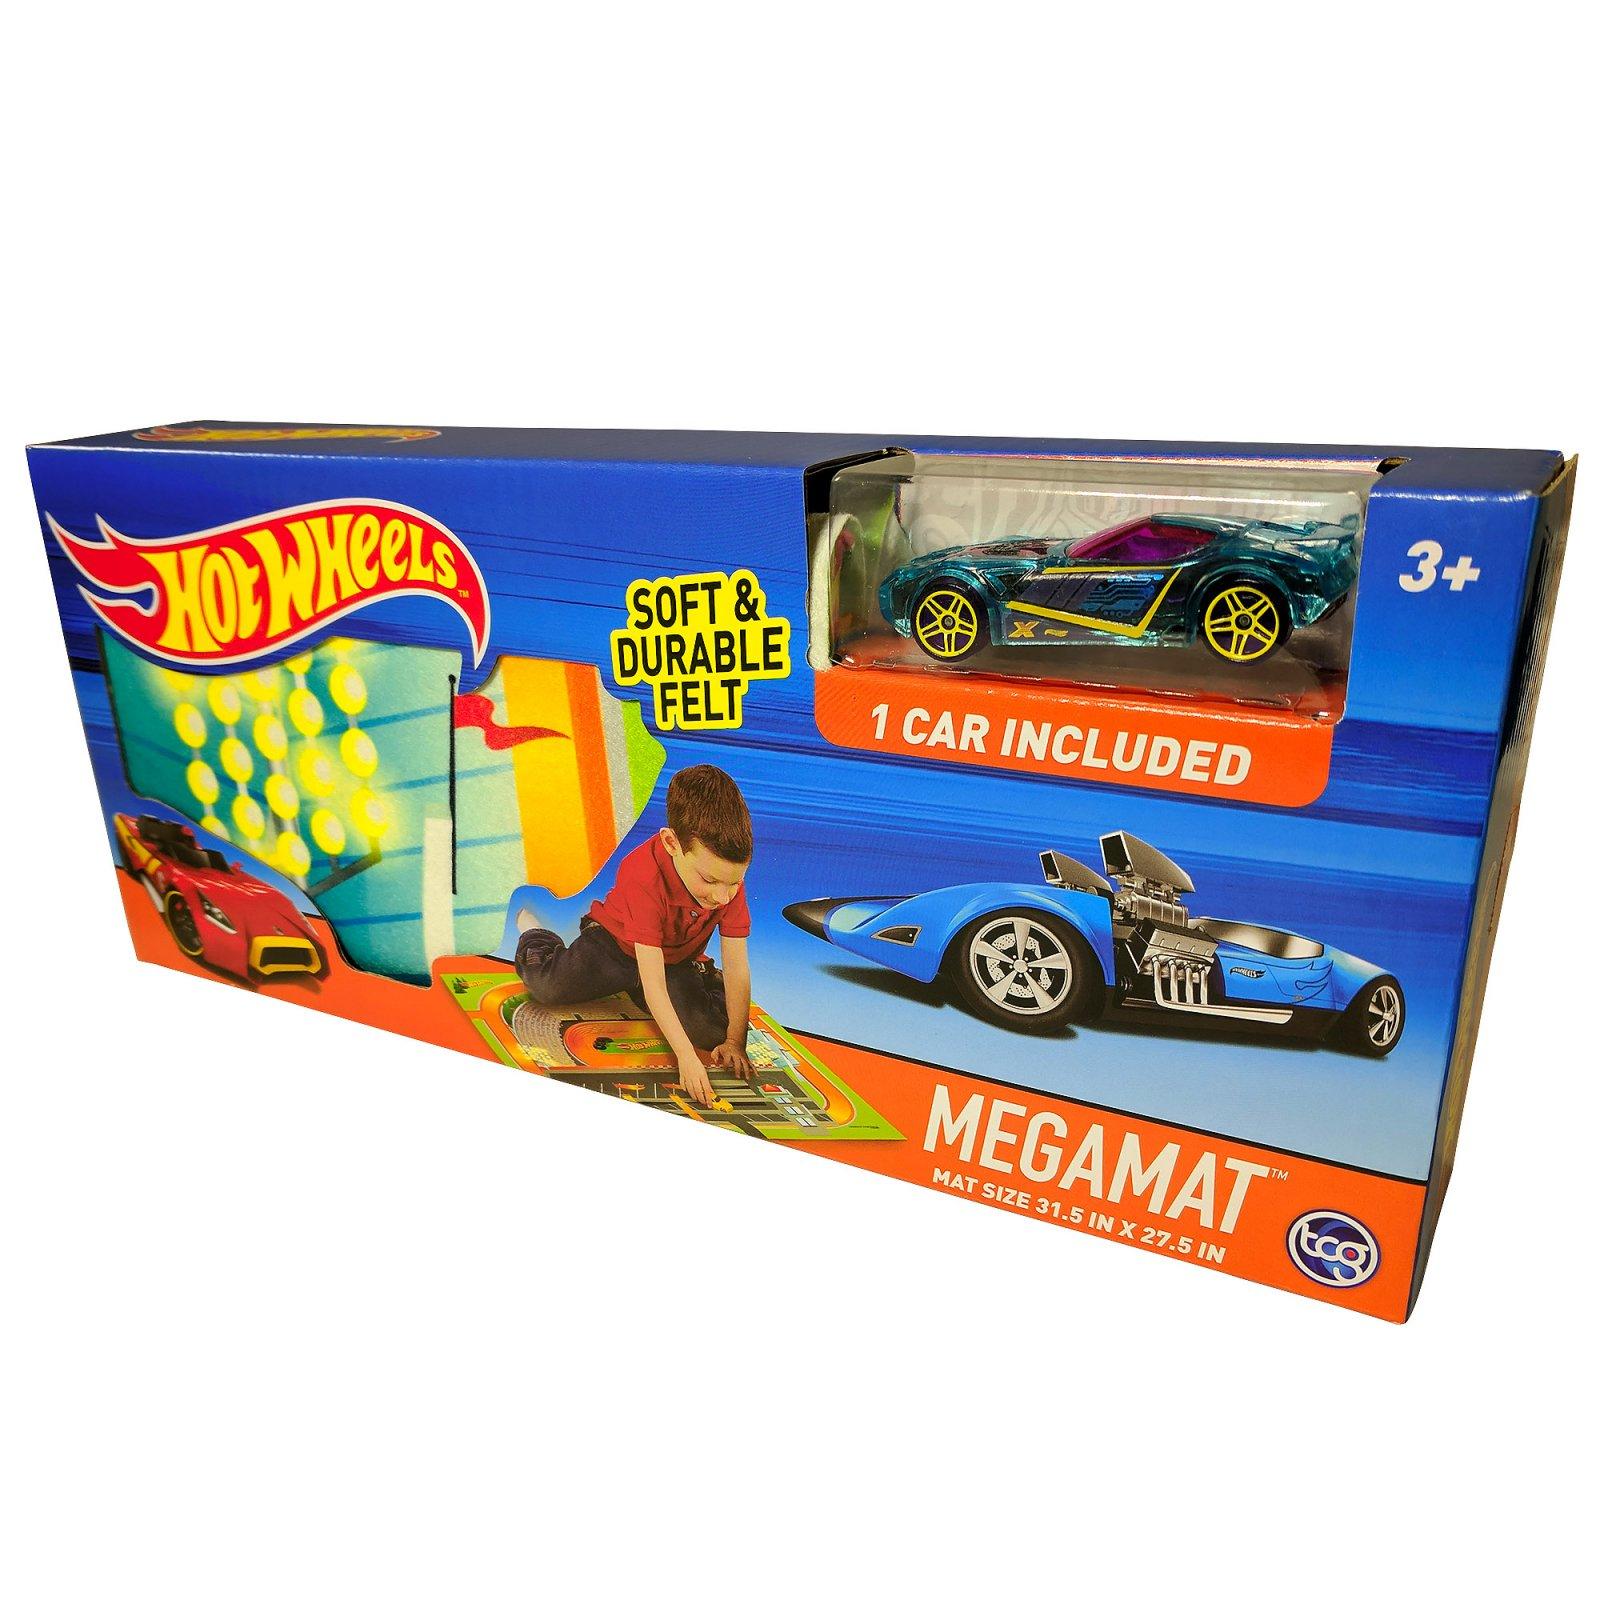 Hot Wheels Felt Mega Playmat with Vehicle